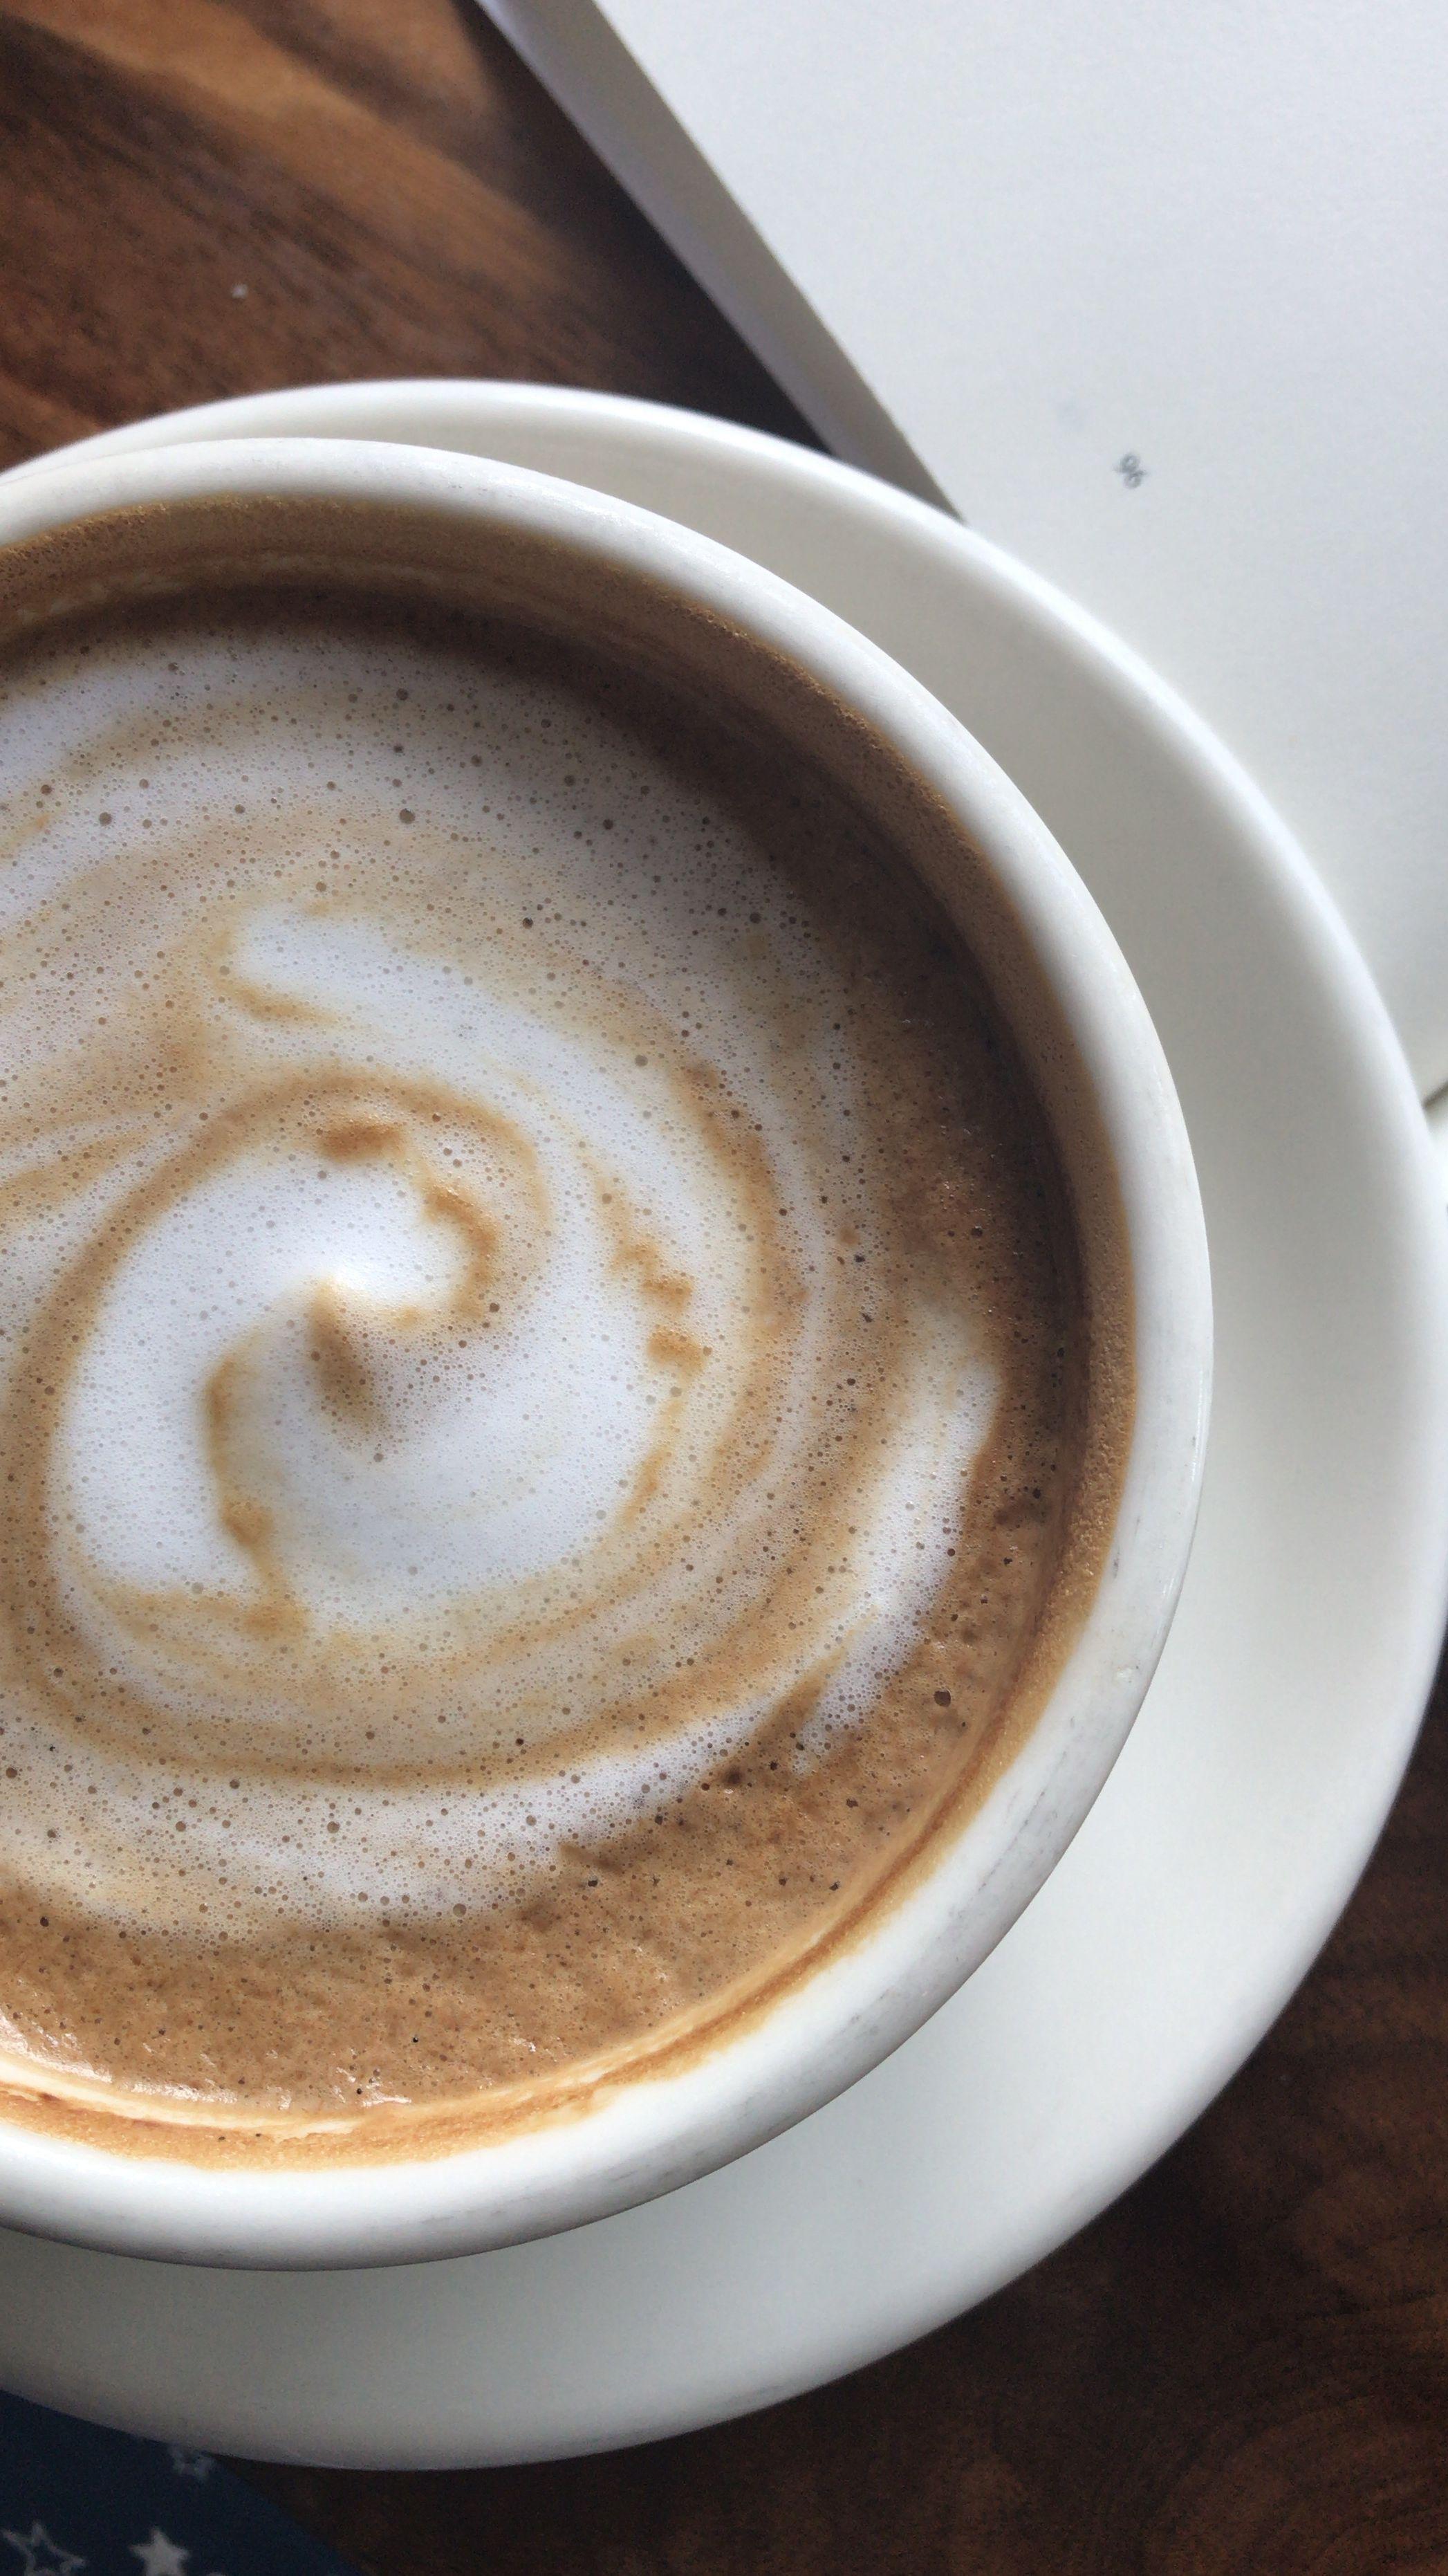 Espressocoffee Aesthetic Coffee Coffee Time Coffee Cafe